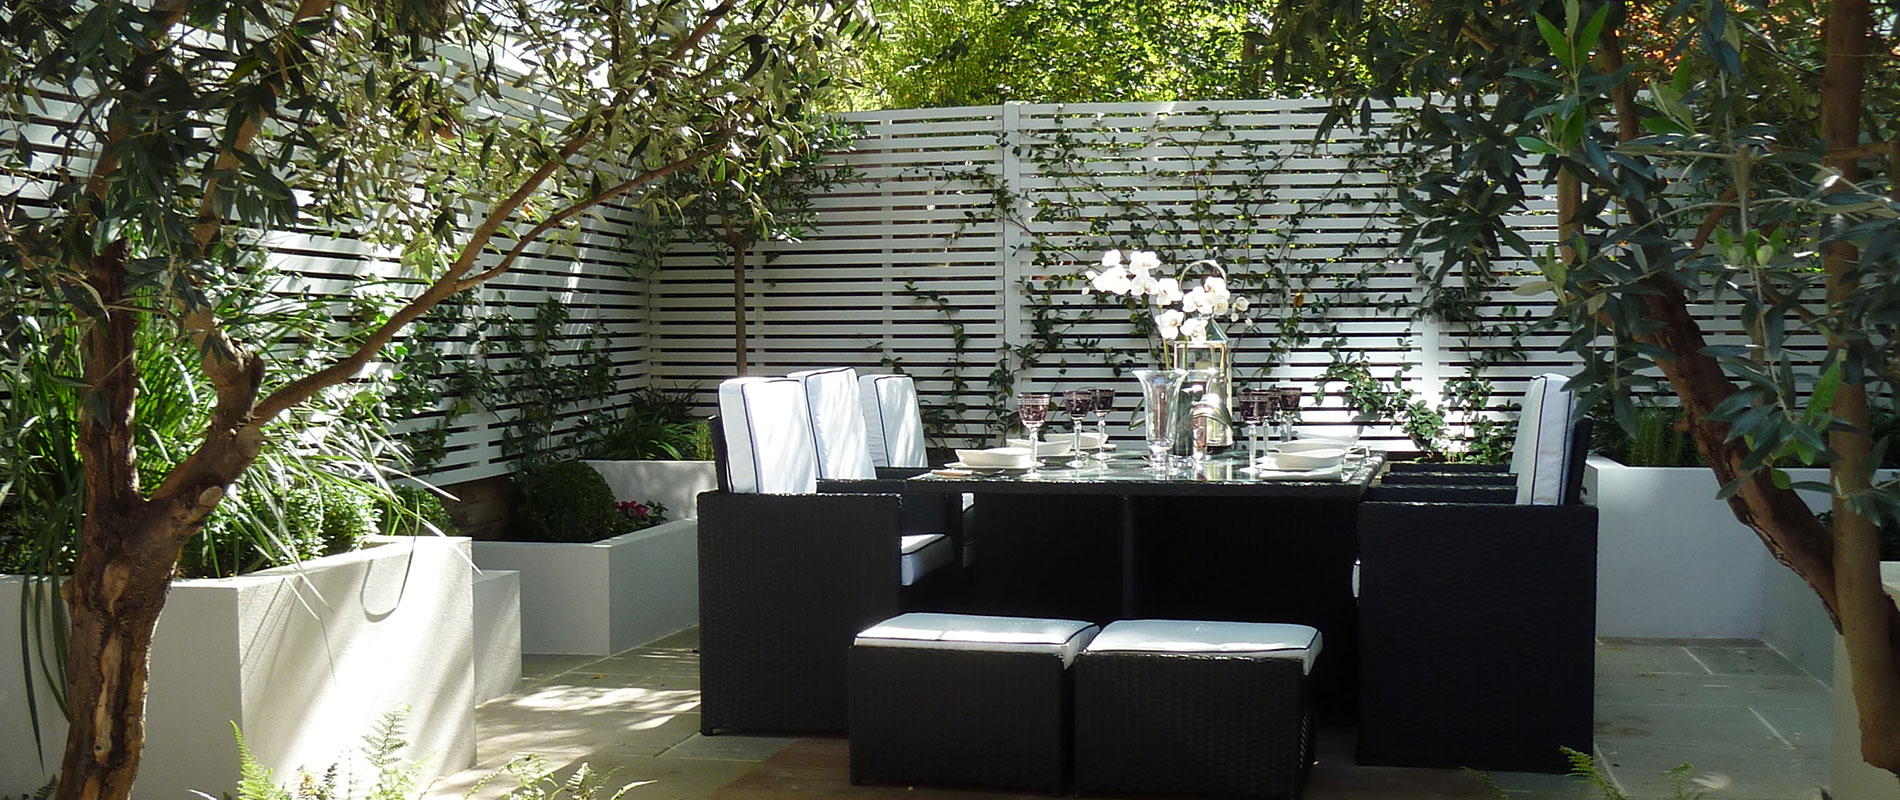 Slatted Screen Creates Sophisticated Al Fresco Dining Area